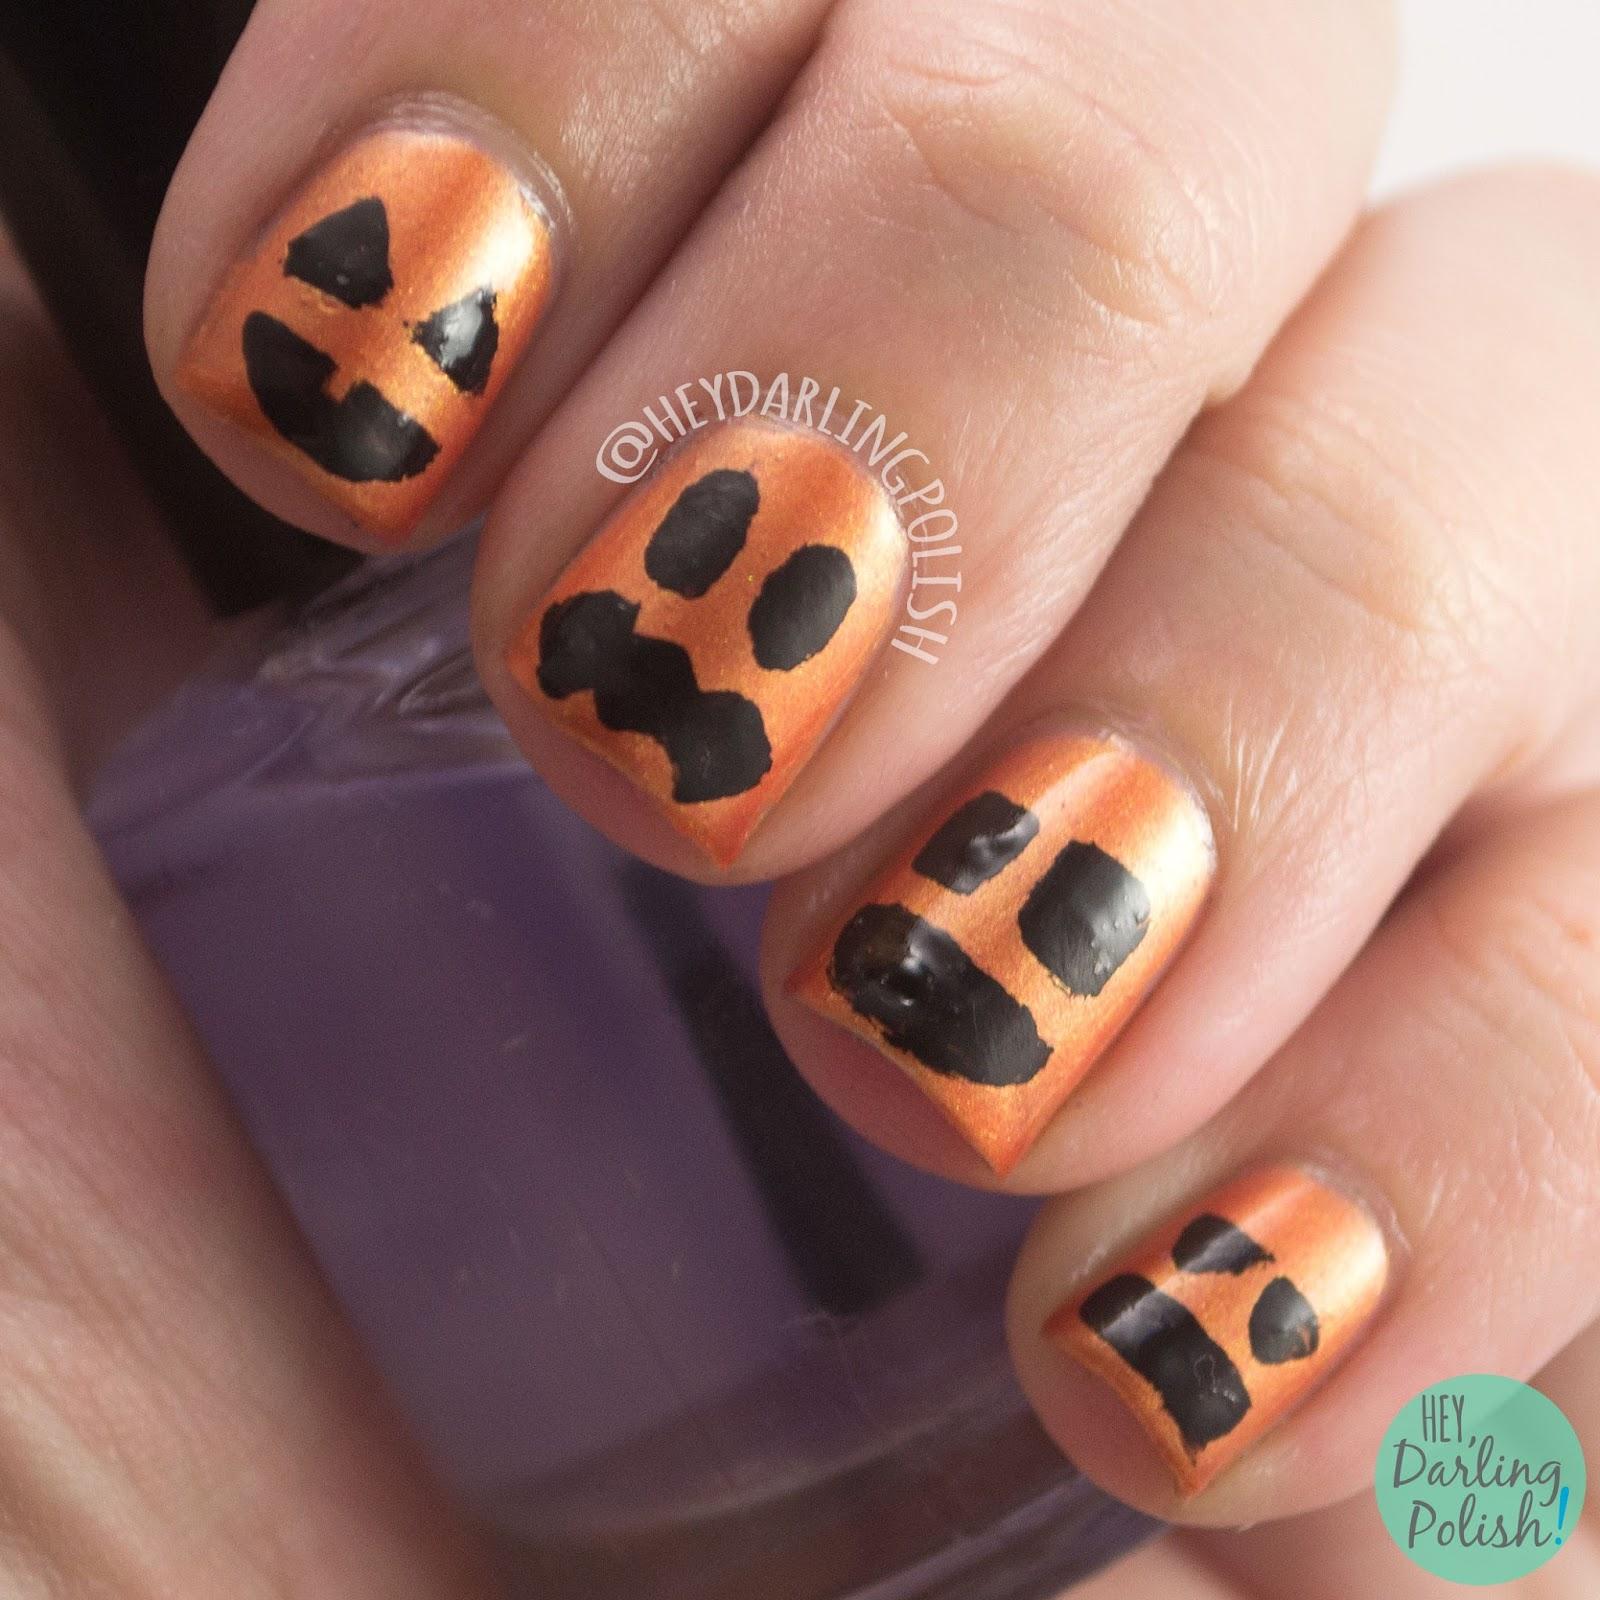 October Nail Art: Hey, Darling Polish!: Liquid Kandi's October Sweet Treat